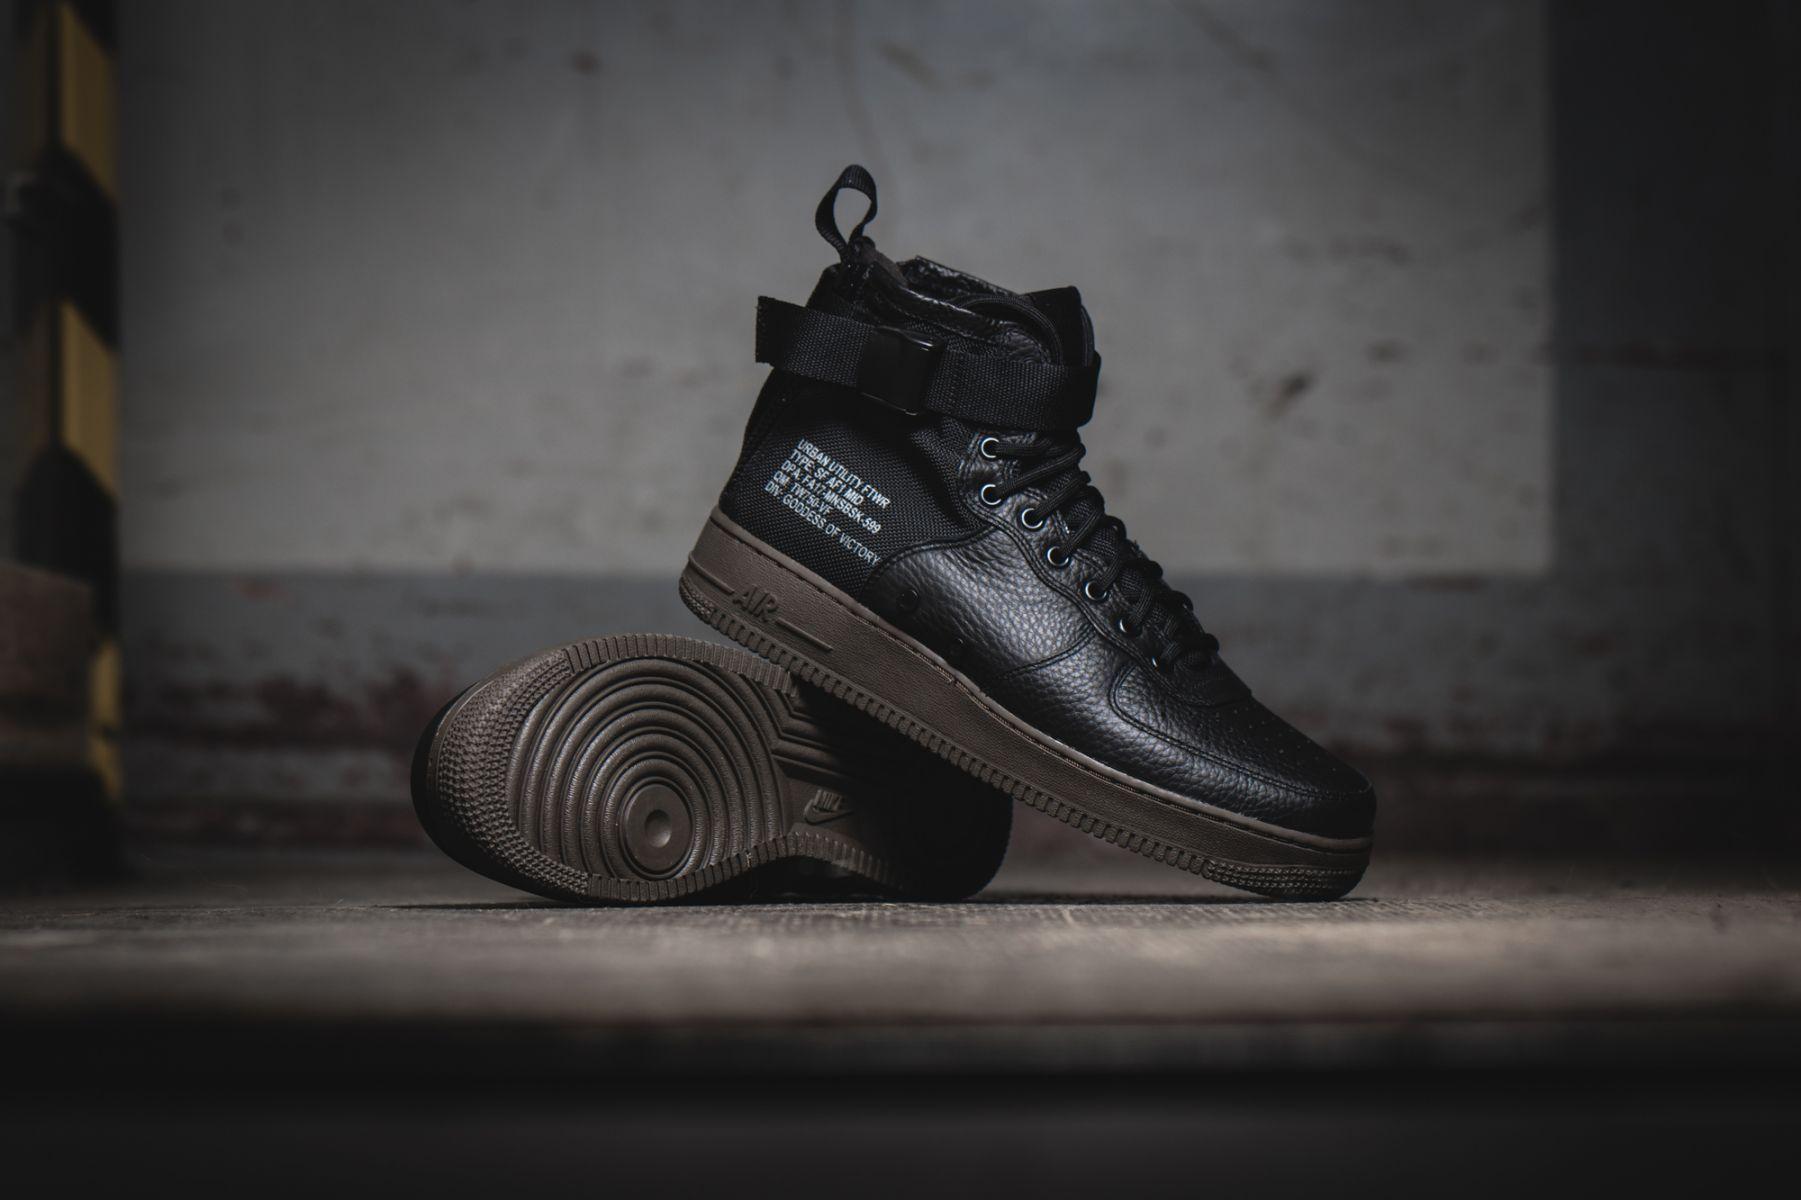 Nike SF AF-1 Mid Black / Dark Hazel Credit : 43einhalb #Nike #